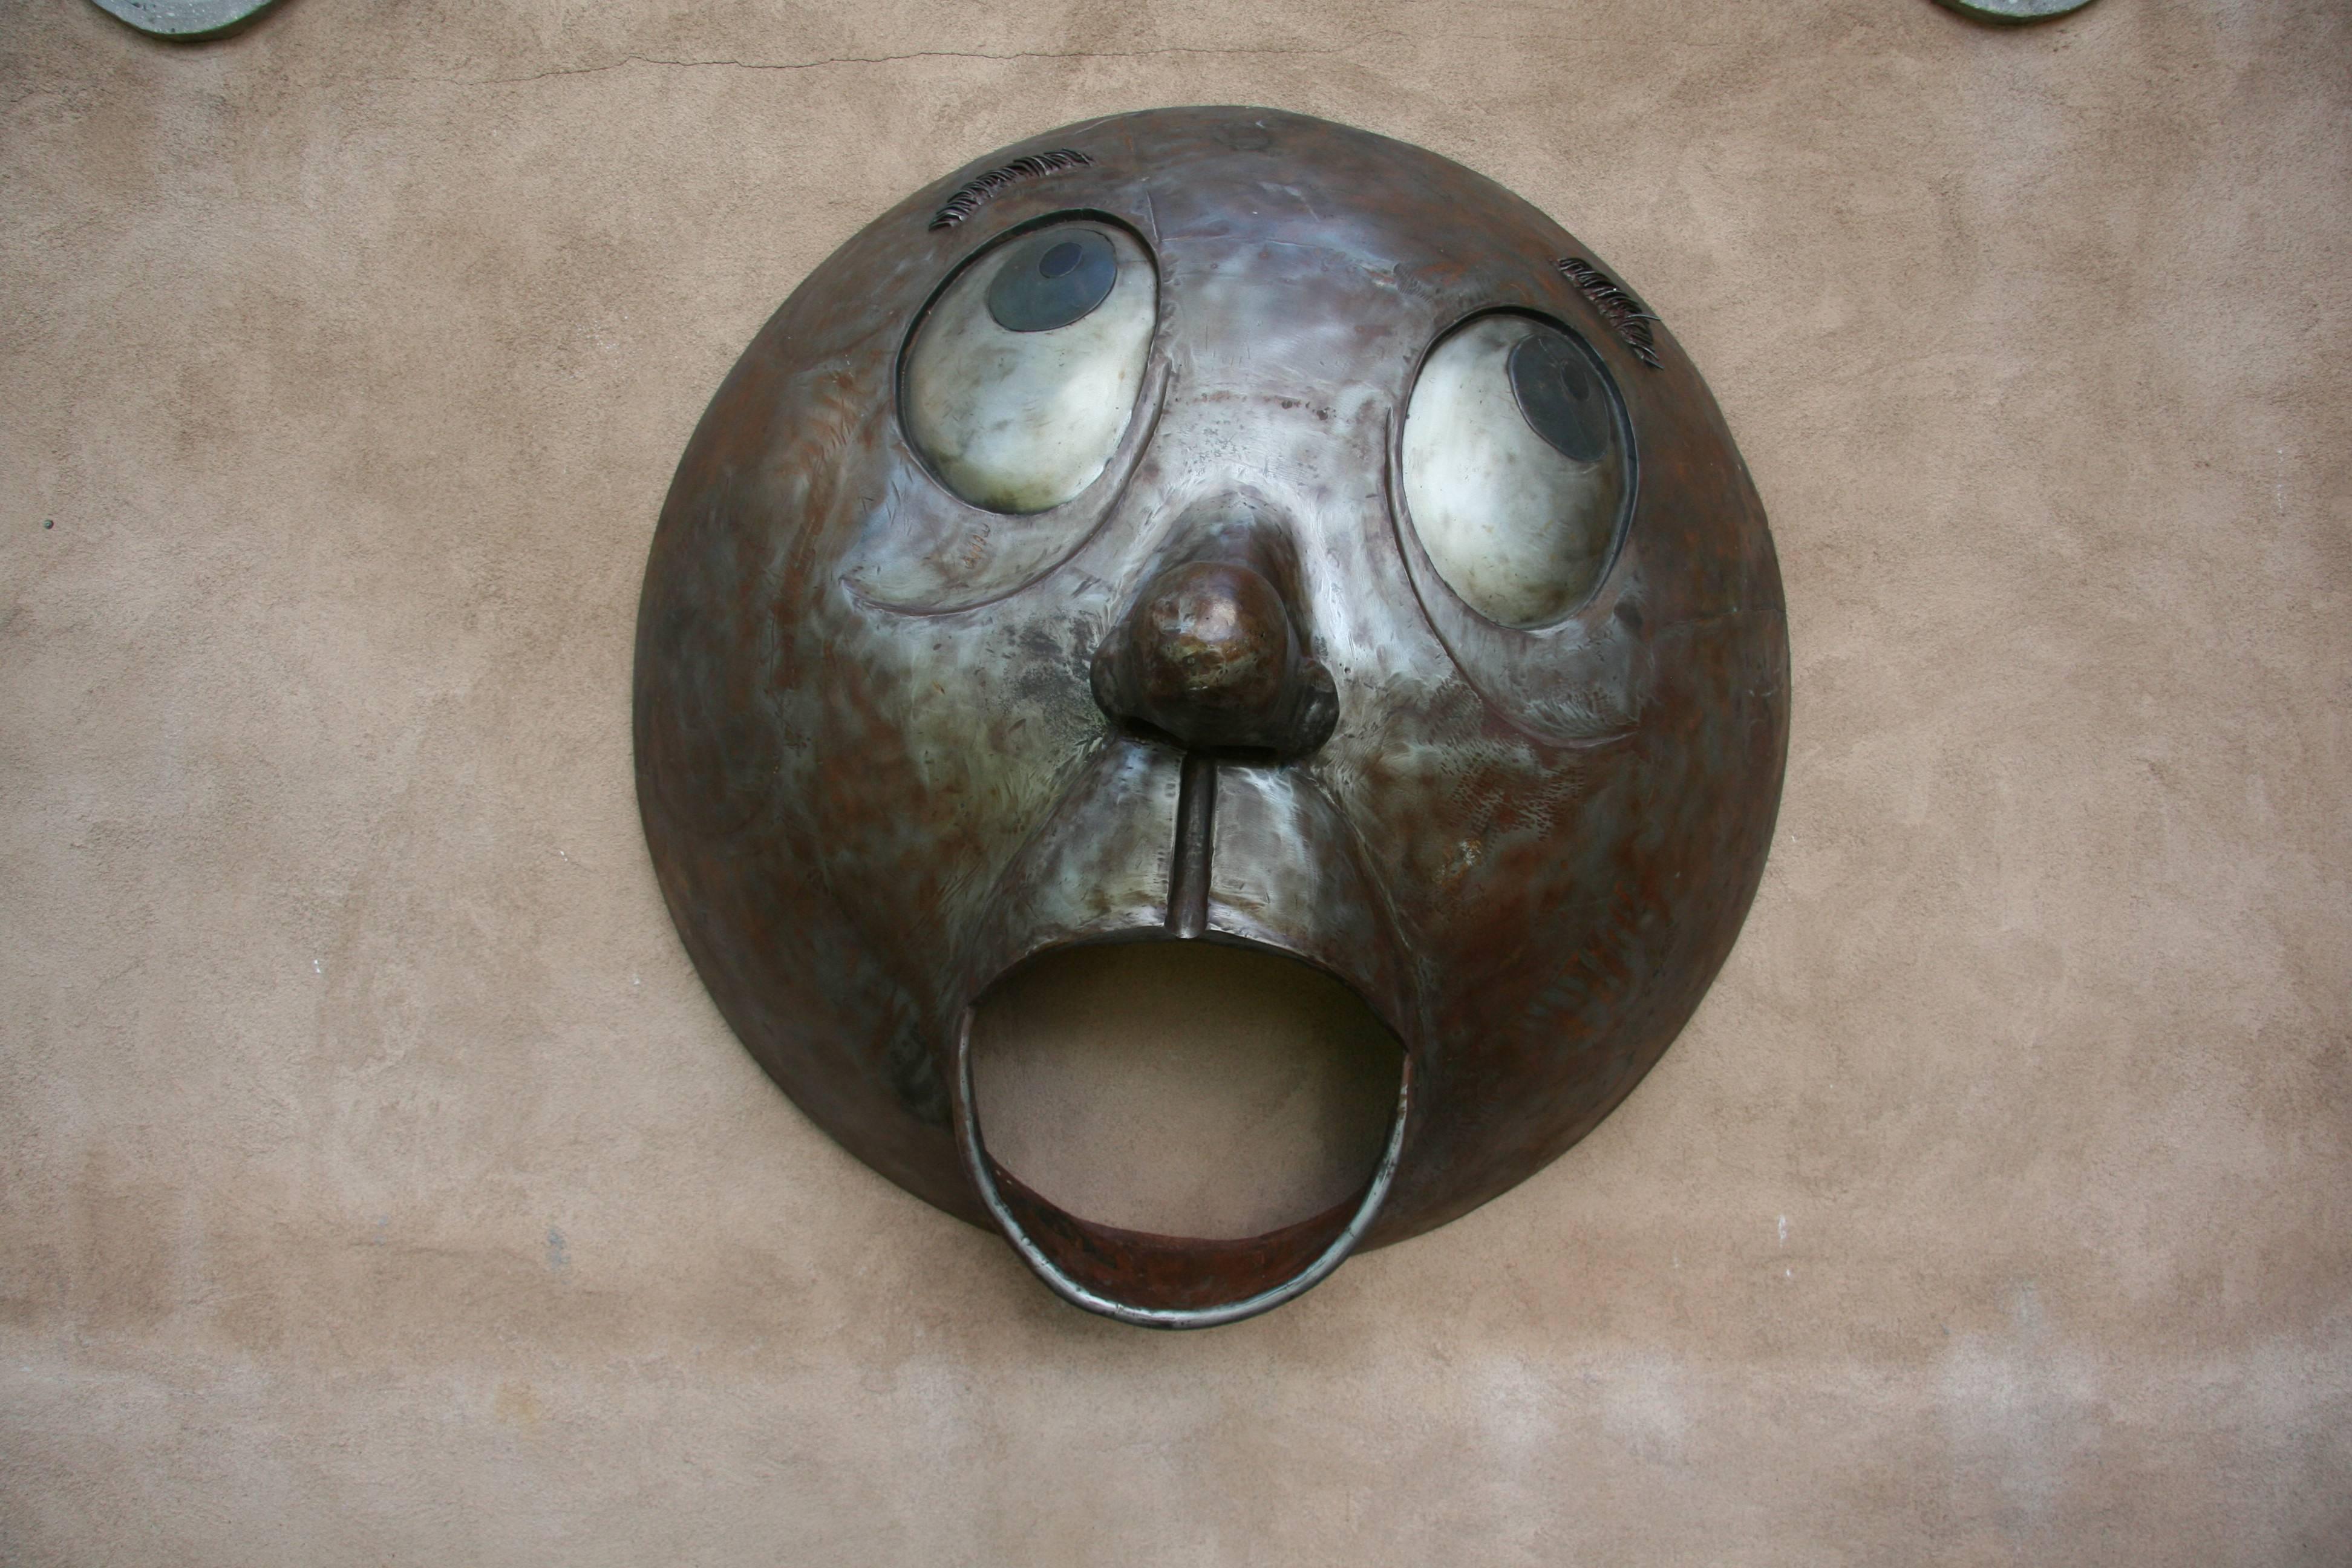 Yelp, Rodger Jacobsen, steel, large wall sculpture, big eyes, humorous, big eyes